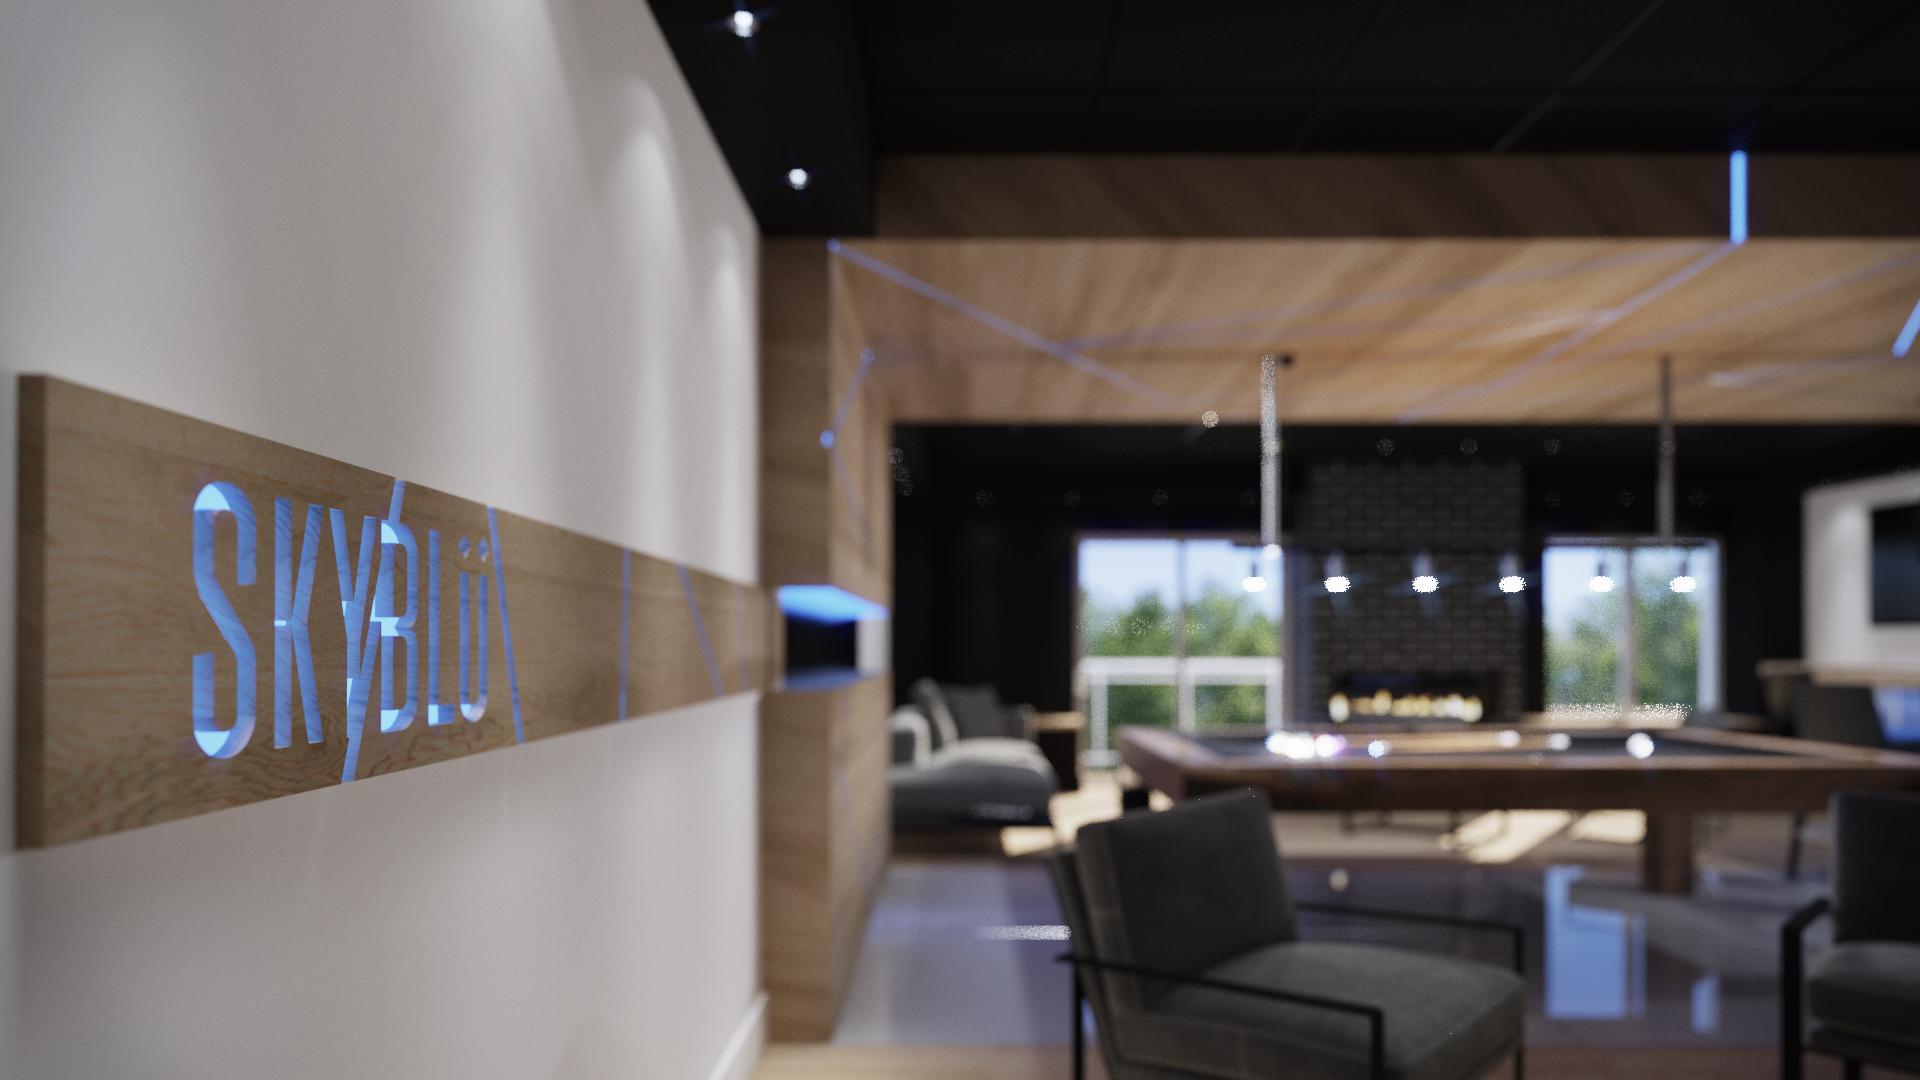 Lounge - Skyblü - Condos neufs a vendre a Mirabel